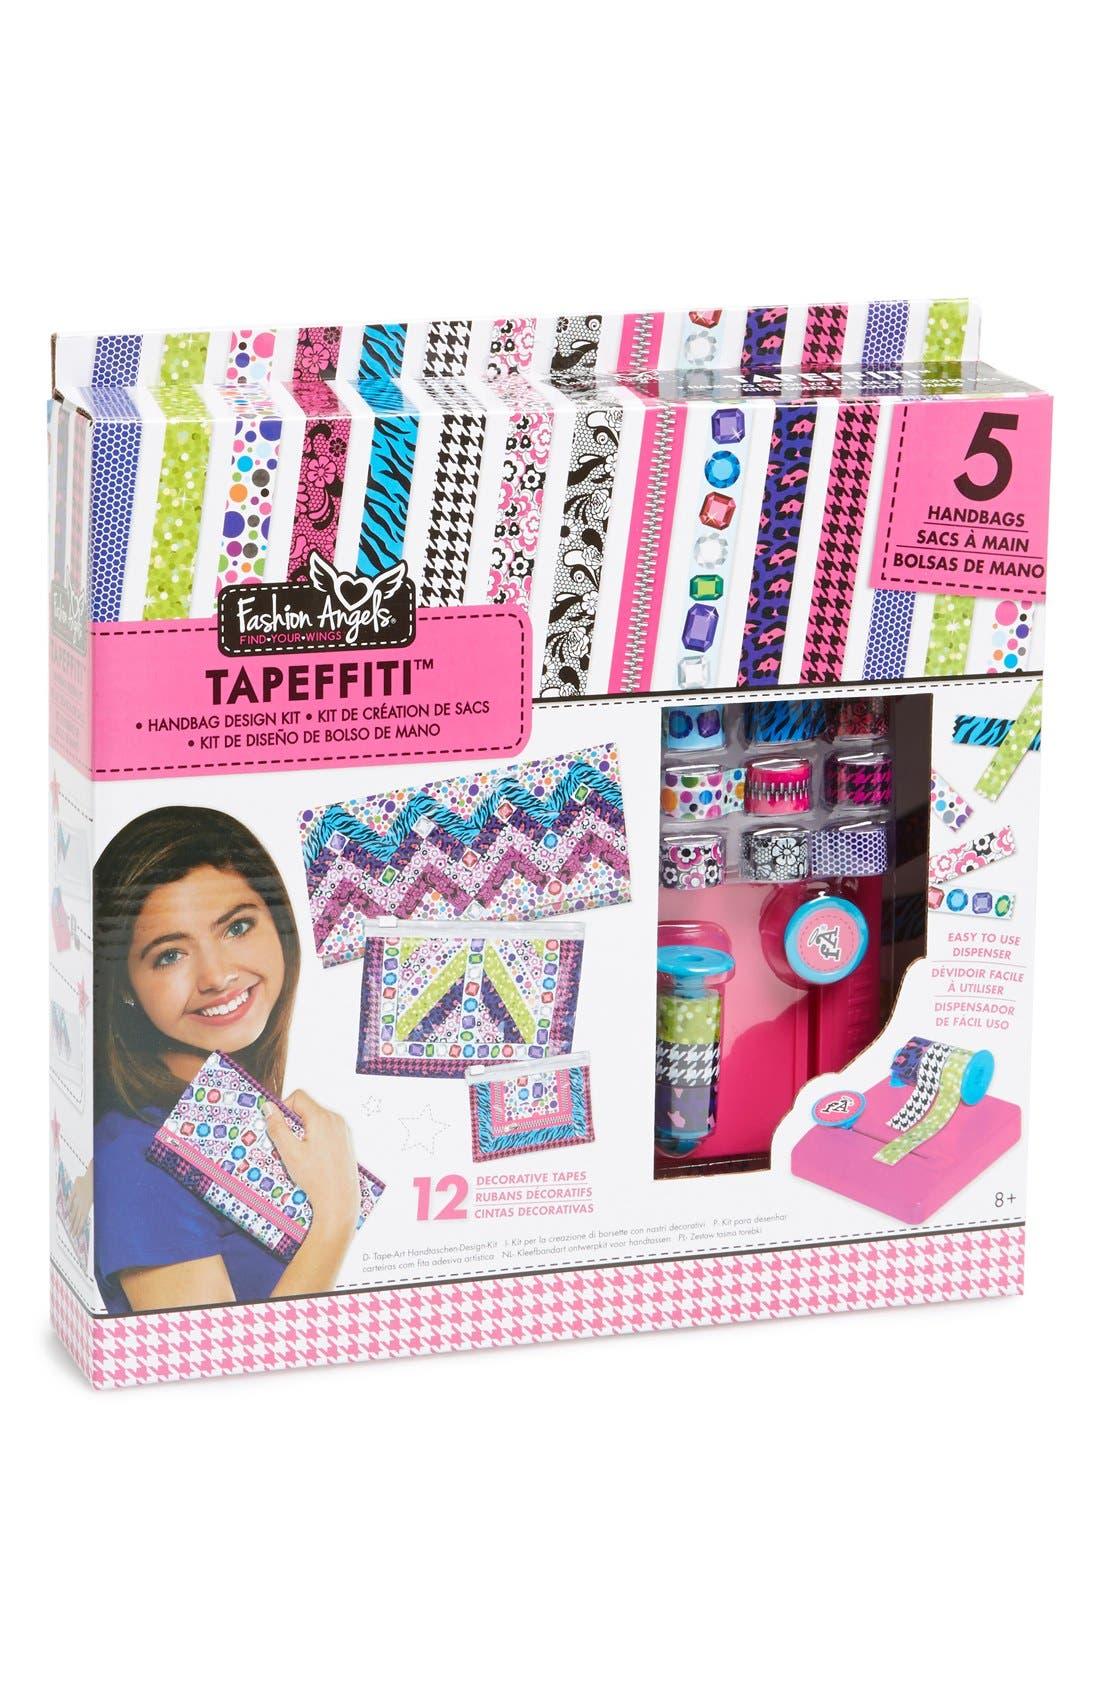 Alternate Image 1 Selected - Fashion Angels 'Tapefetti™' Handbag Kit